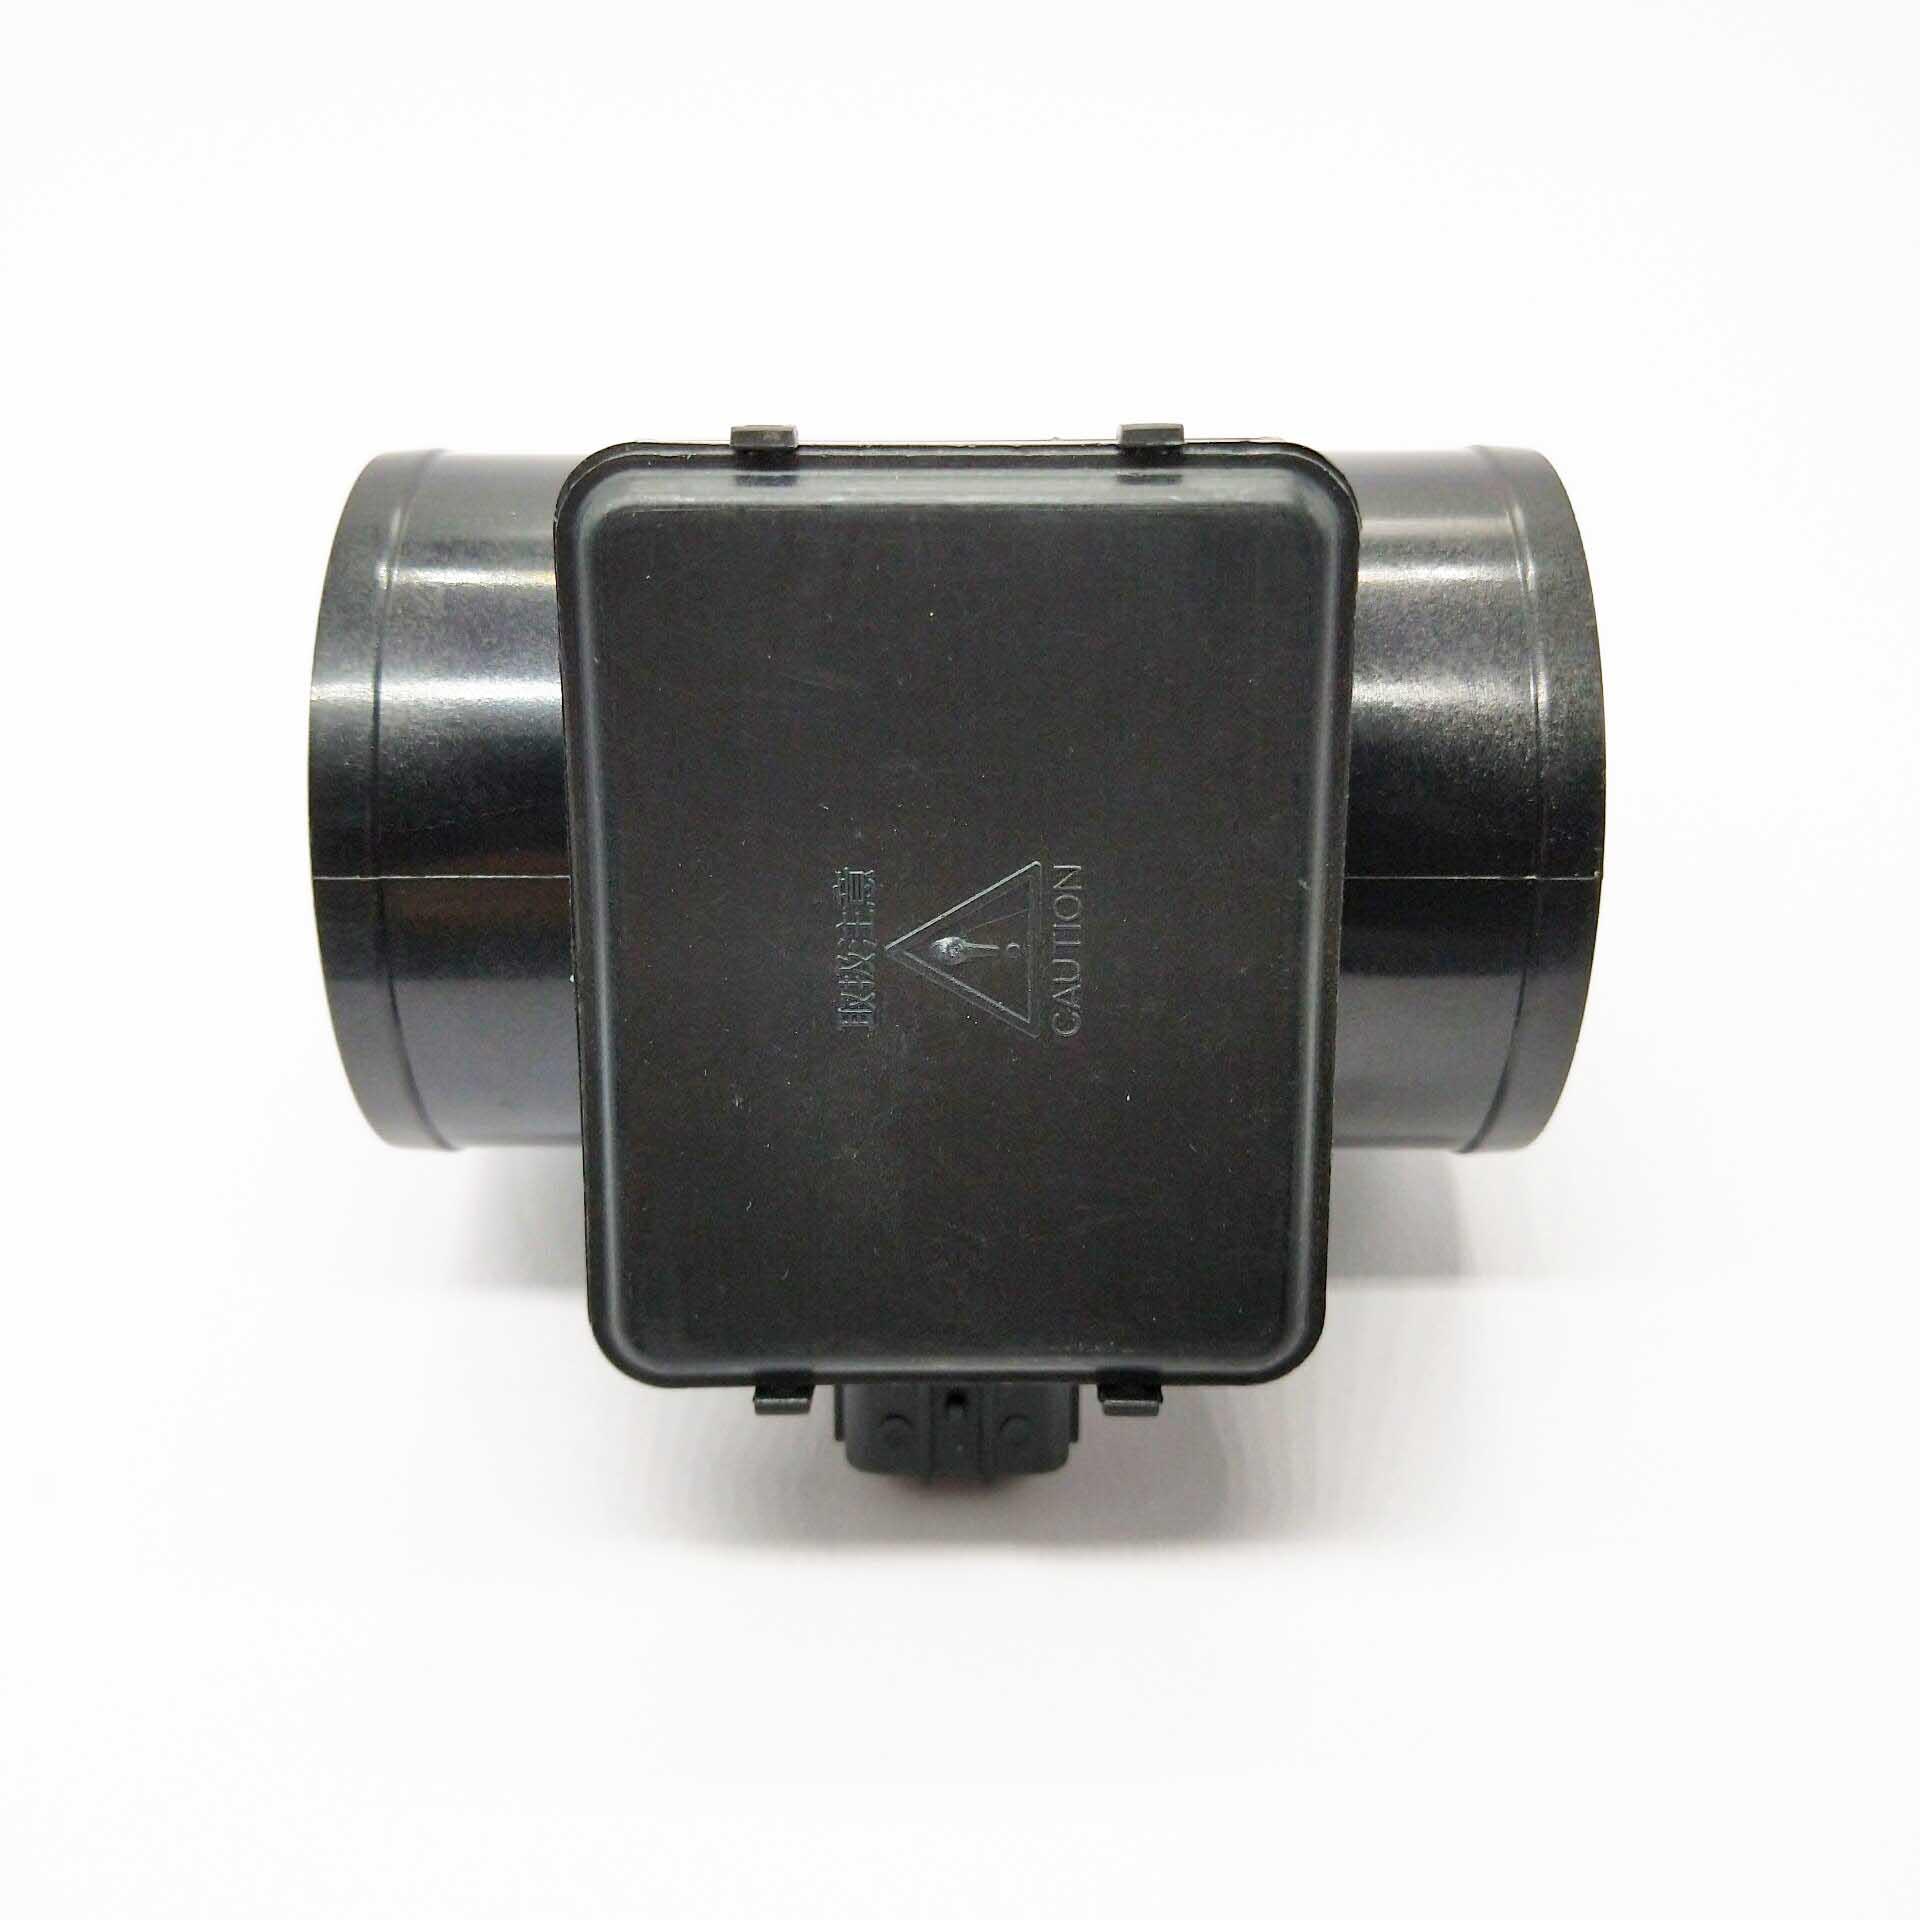 Suzuki Sidekick X-90 Geo Tracker Mass Air Flow Meter Sensor 1380058B00 NEW